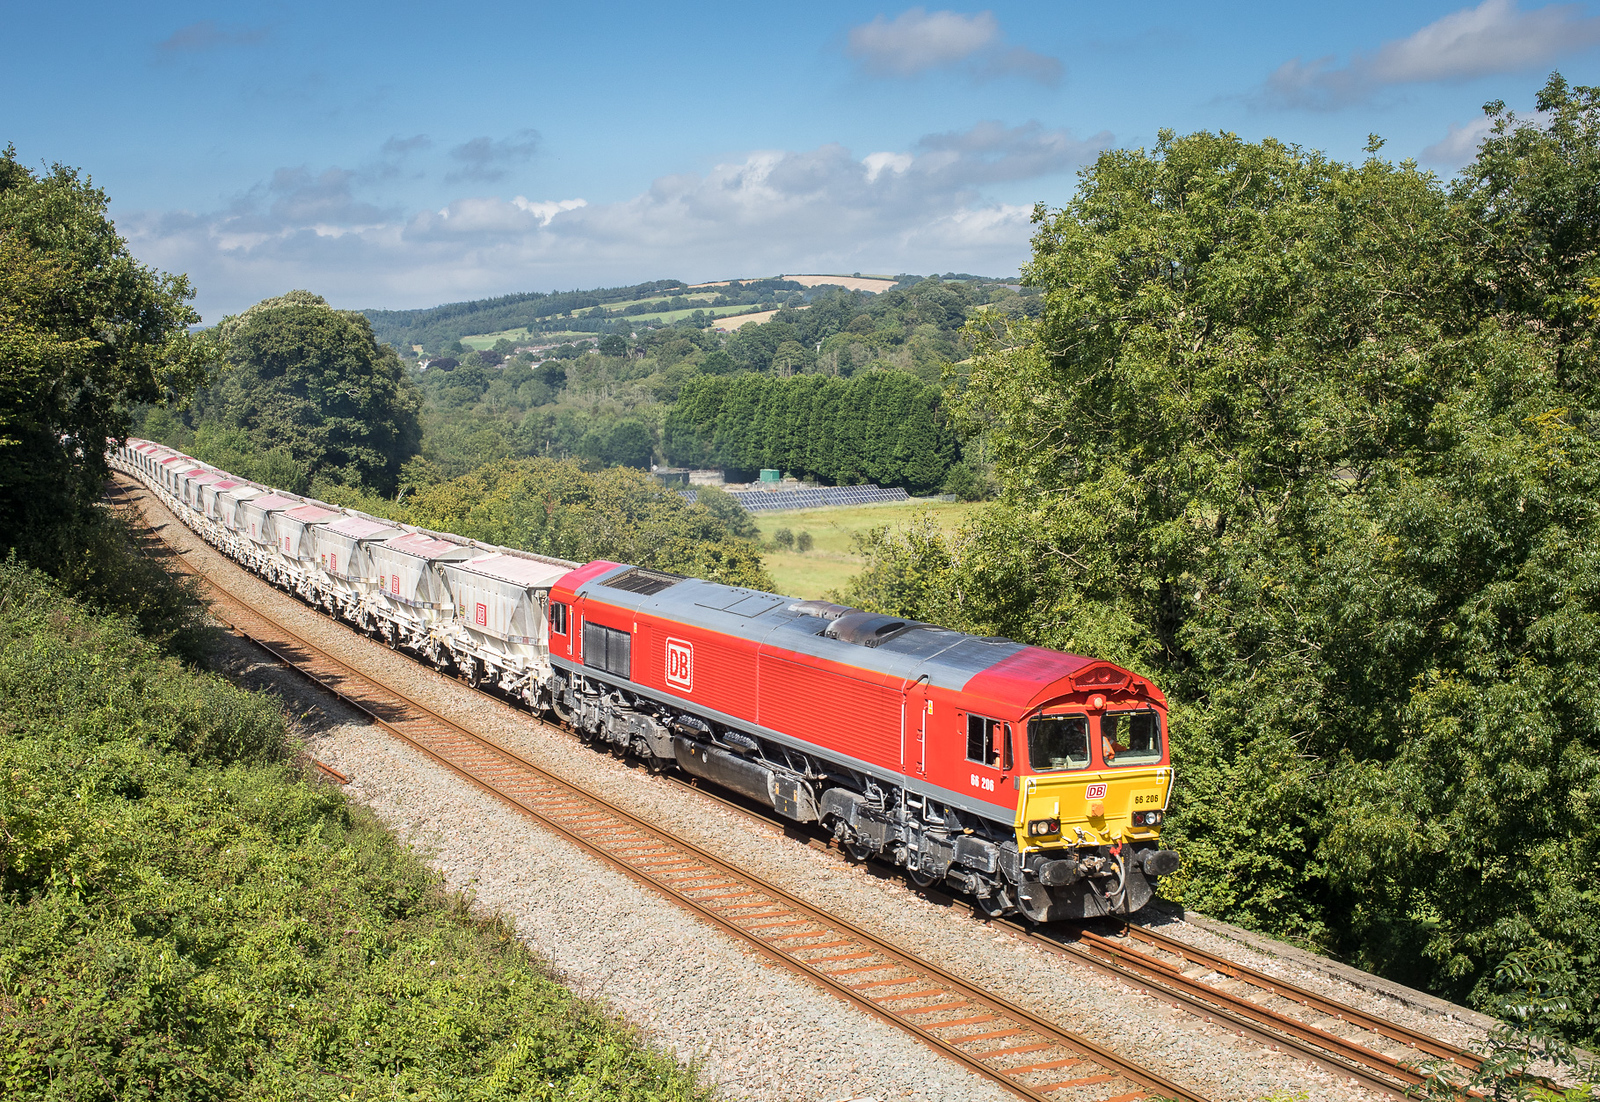 210817  66206 approaches the farm bridge at Milltown with the 6G07 13:50 Fowey-Goonbarrow